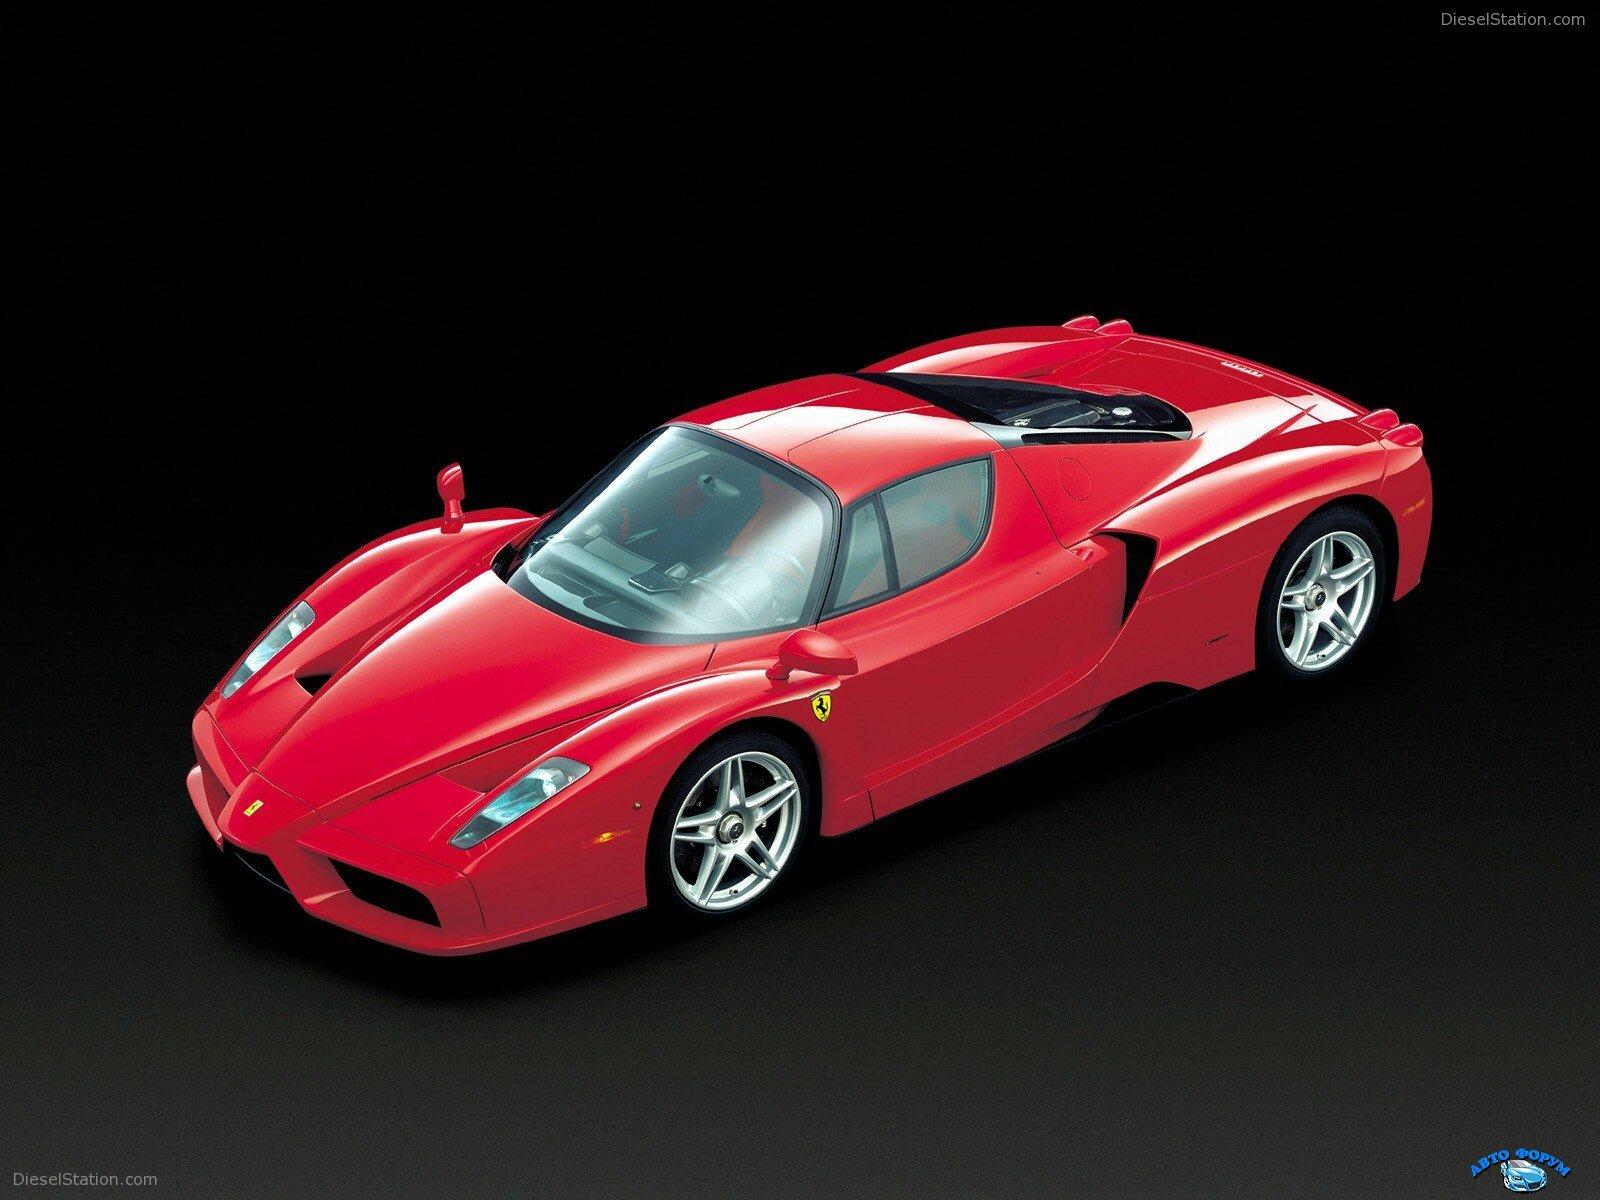 Ferrari-Enzo-001.jpg